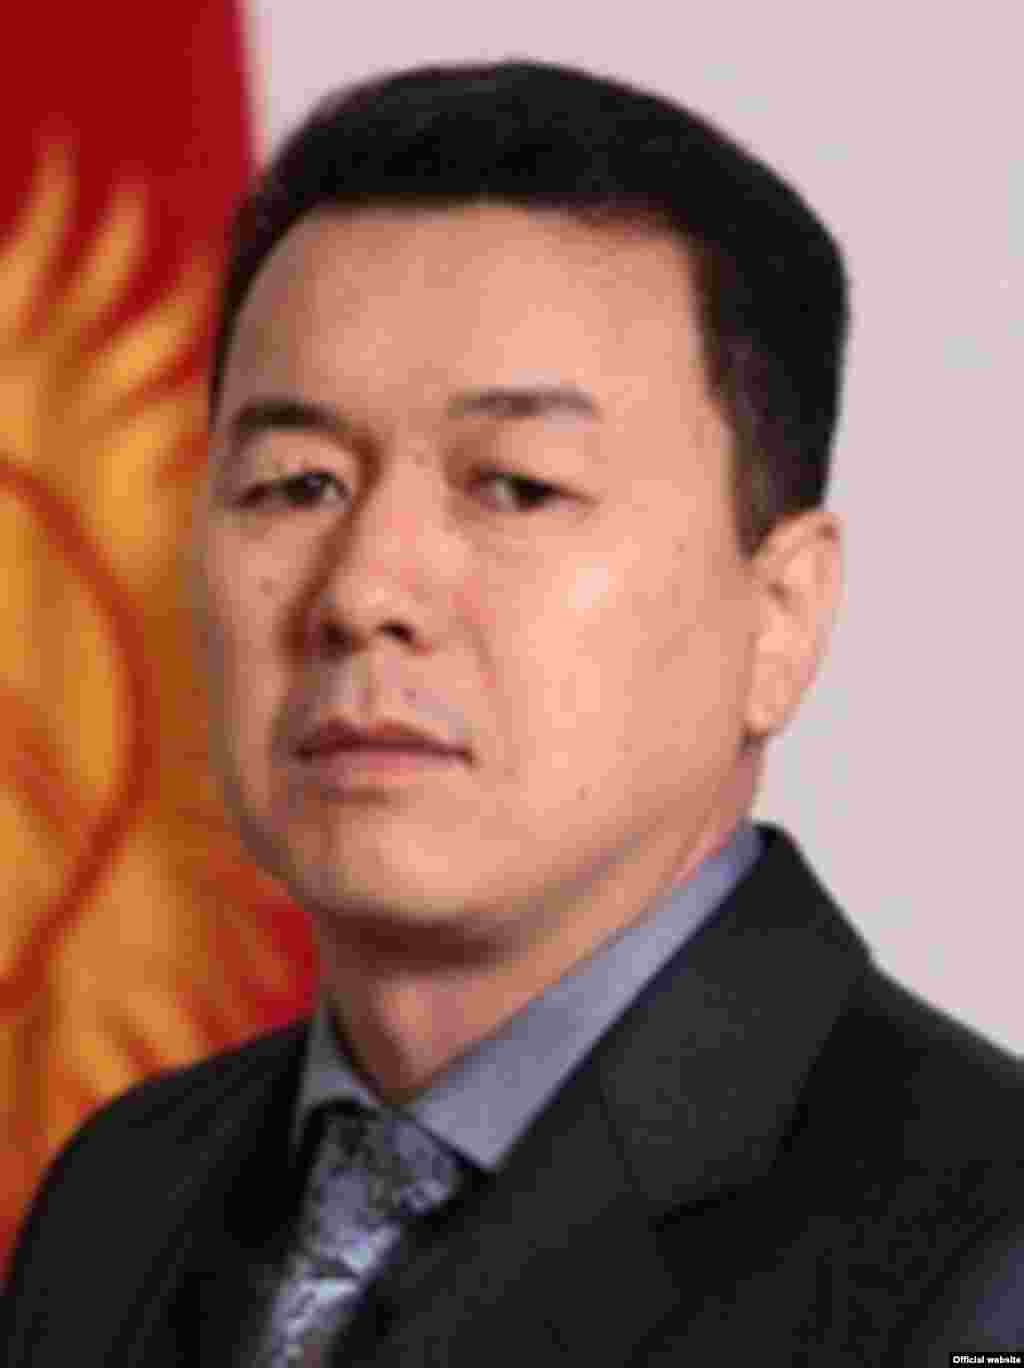 Алиасбек Алымкулов, министр молодежи, труда и занятости.